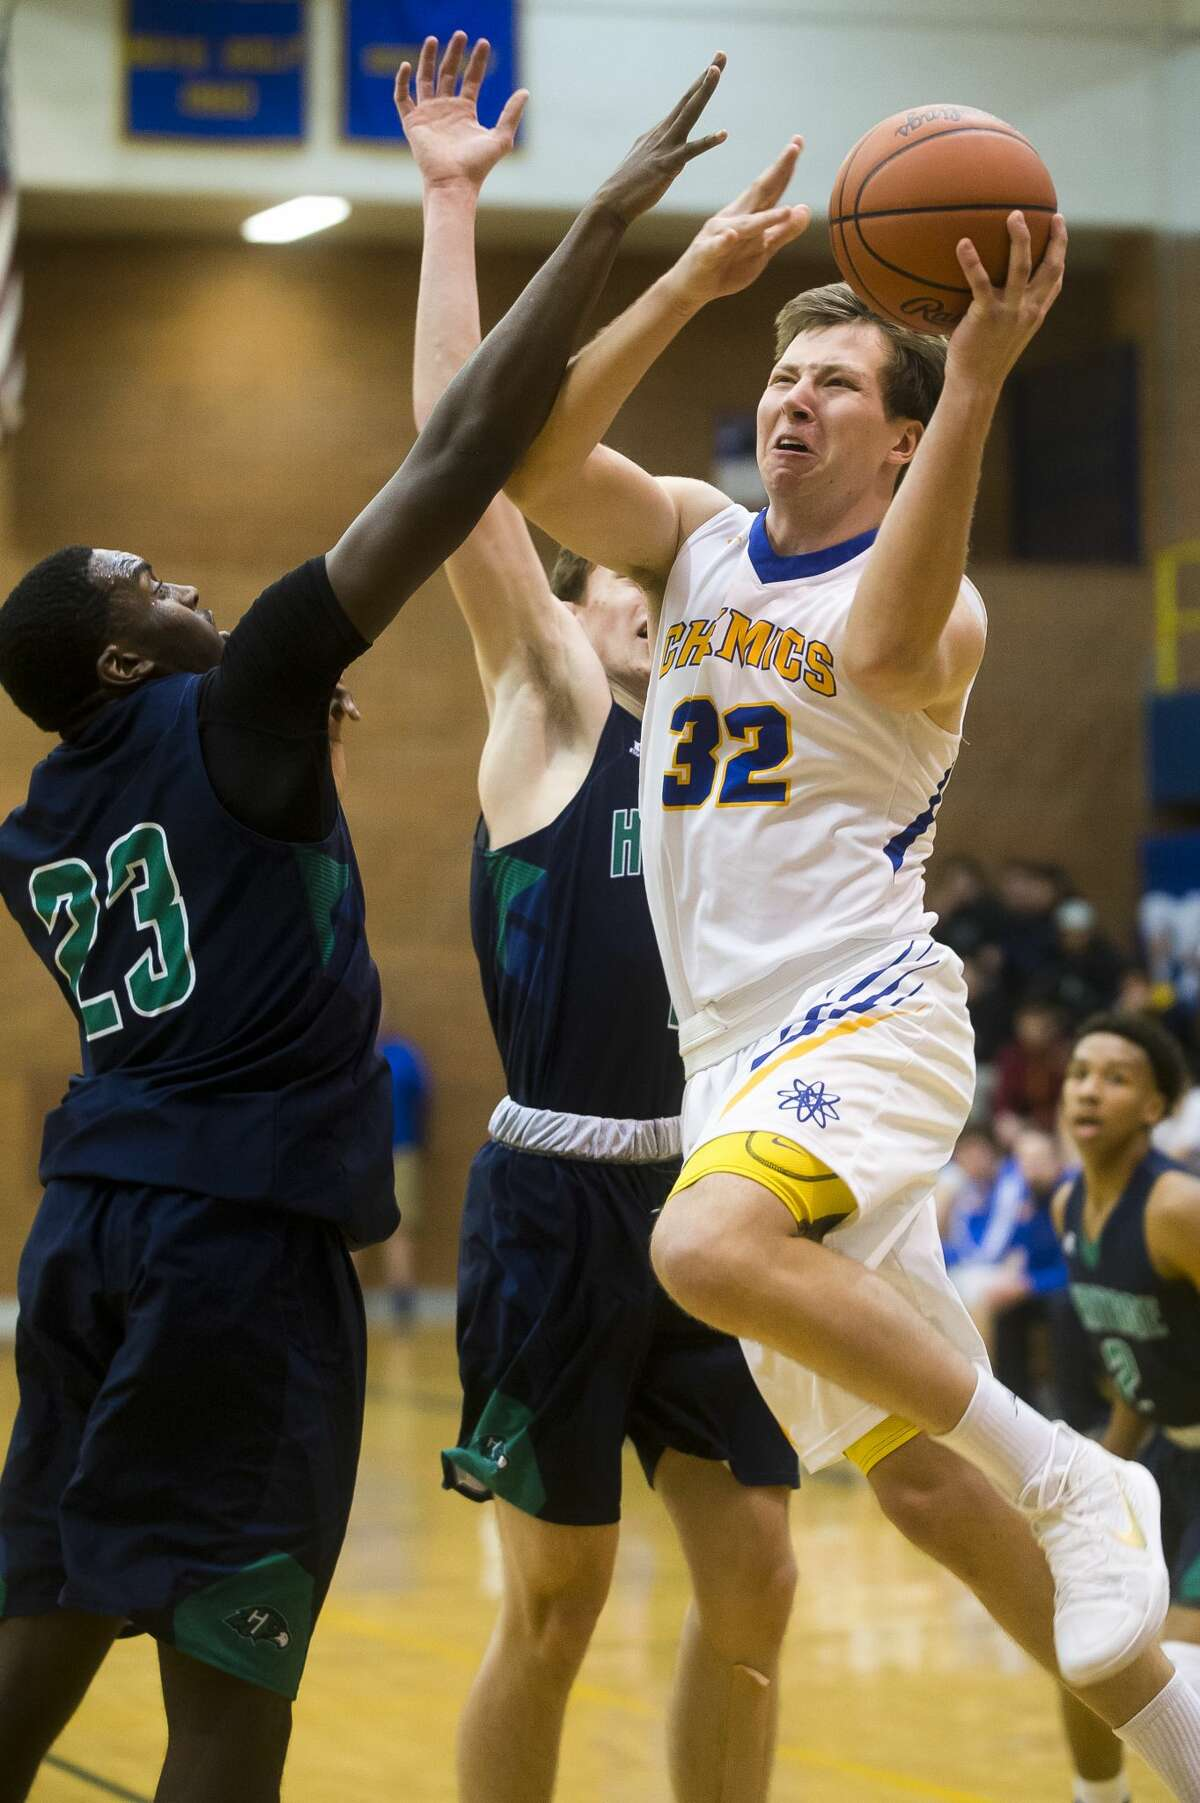 Midland senior Garrett Willis takes a shot as Saginaw Heritage senior Justin McMurren guards him during their game on Tuesday, Dec. 5, 2017 at Midland High School. (Katy Kildee/kkildee@mdn.net)